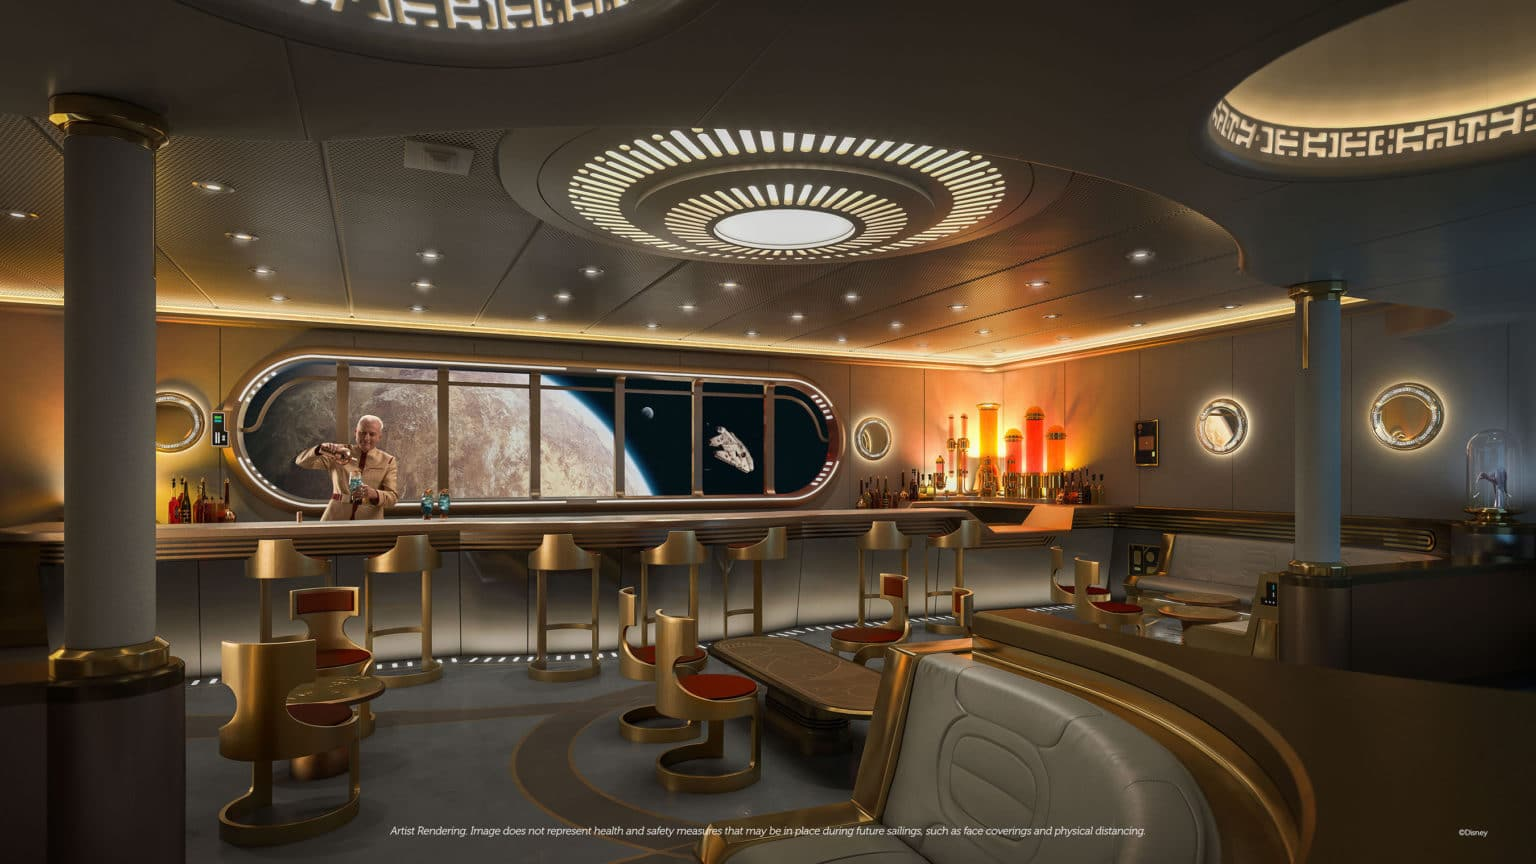 Disney Wish – Star Wars: Hyperspace Lounge